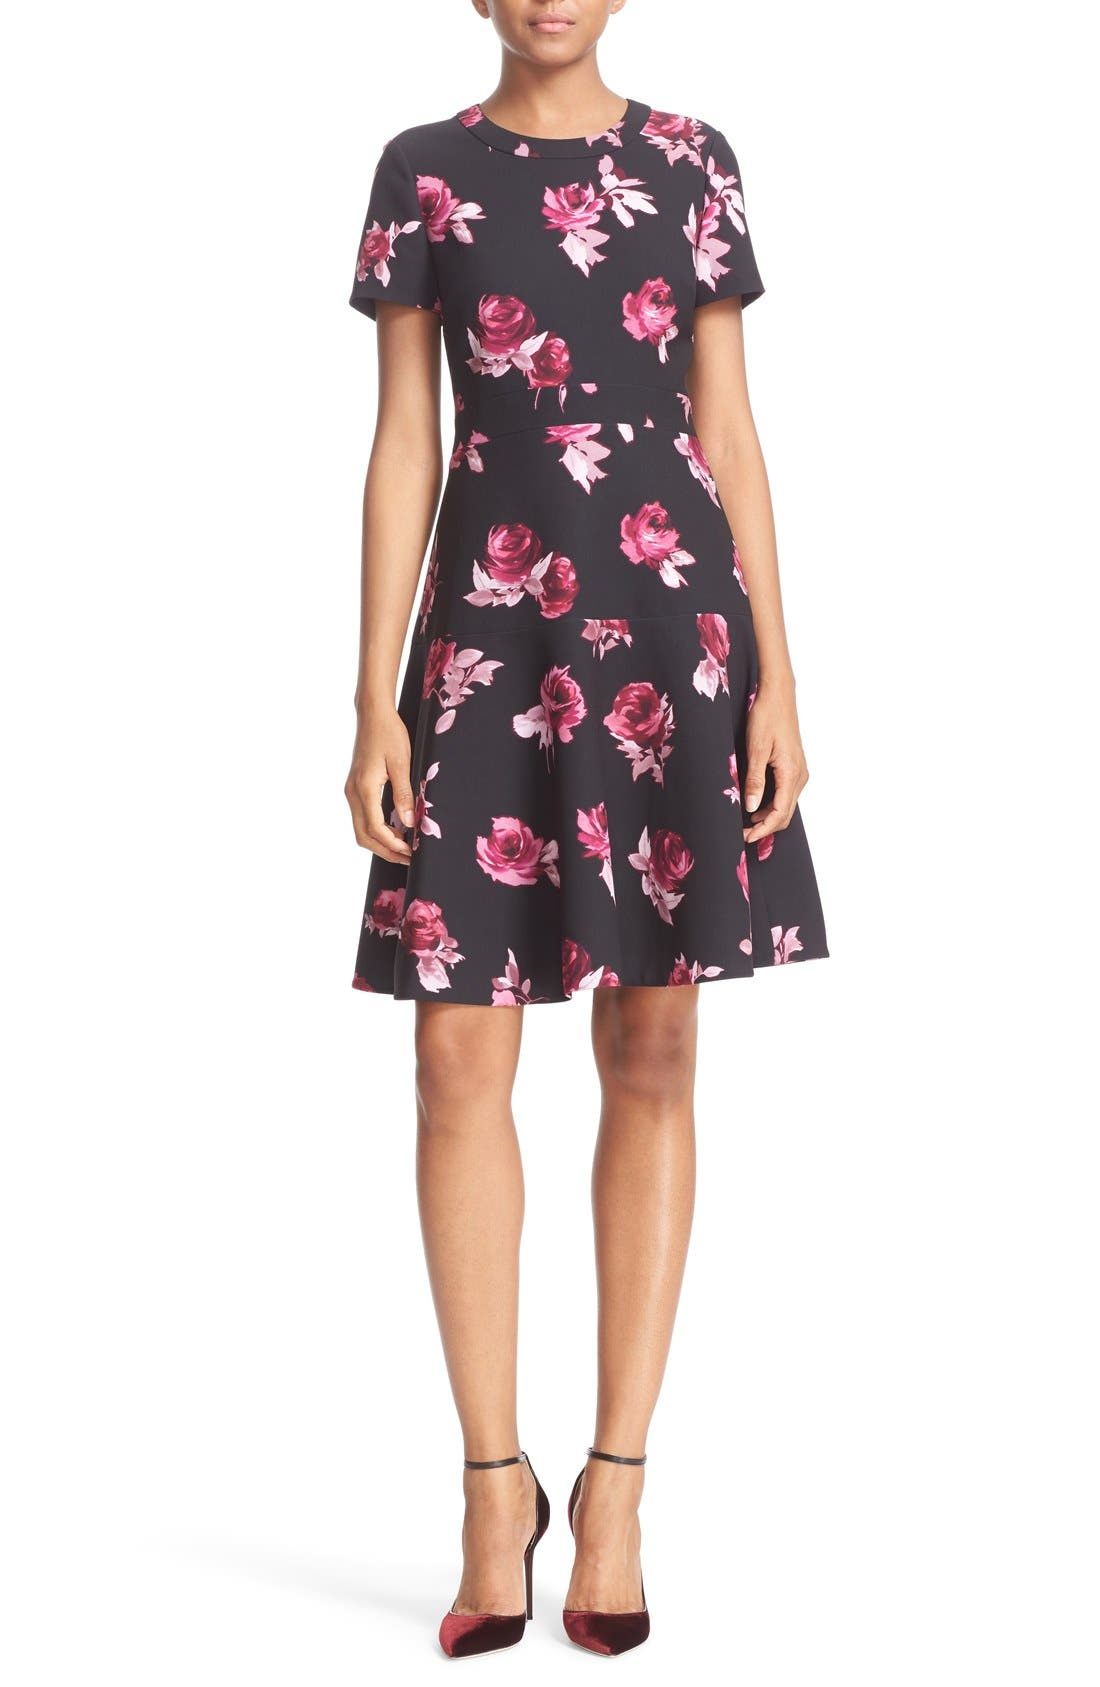 KATE SPADE NEW YORK, 'encore rose' crepe fit & flare dress, Main thumbnail 1, color, 001